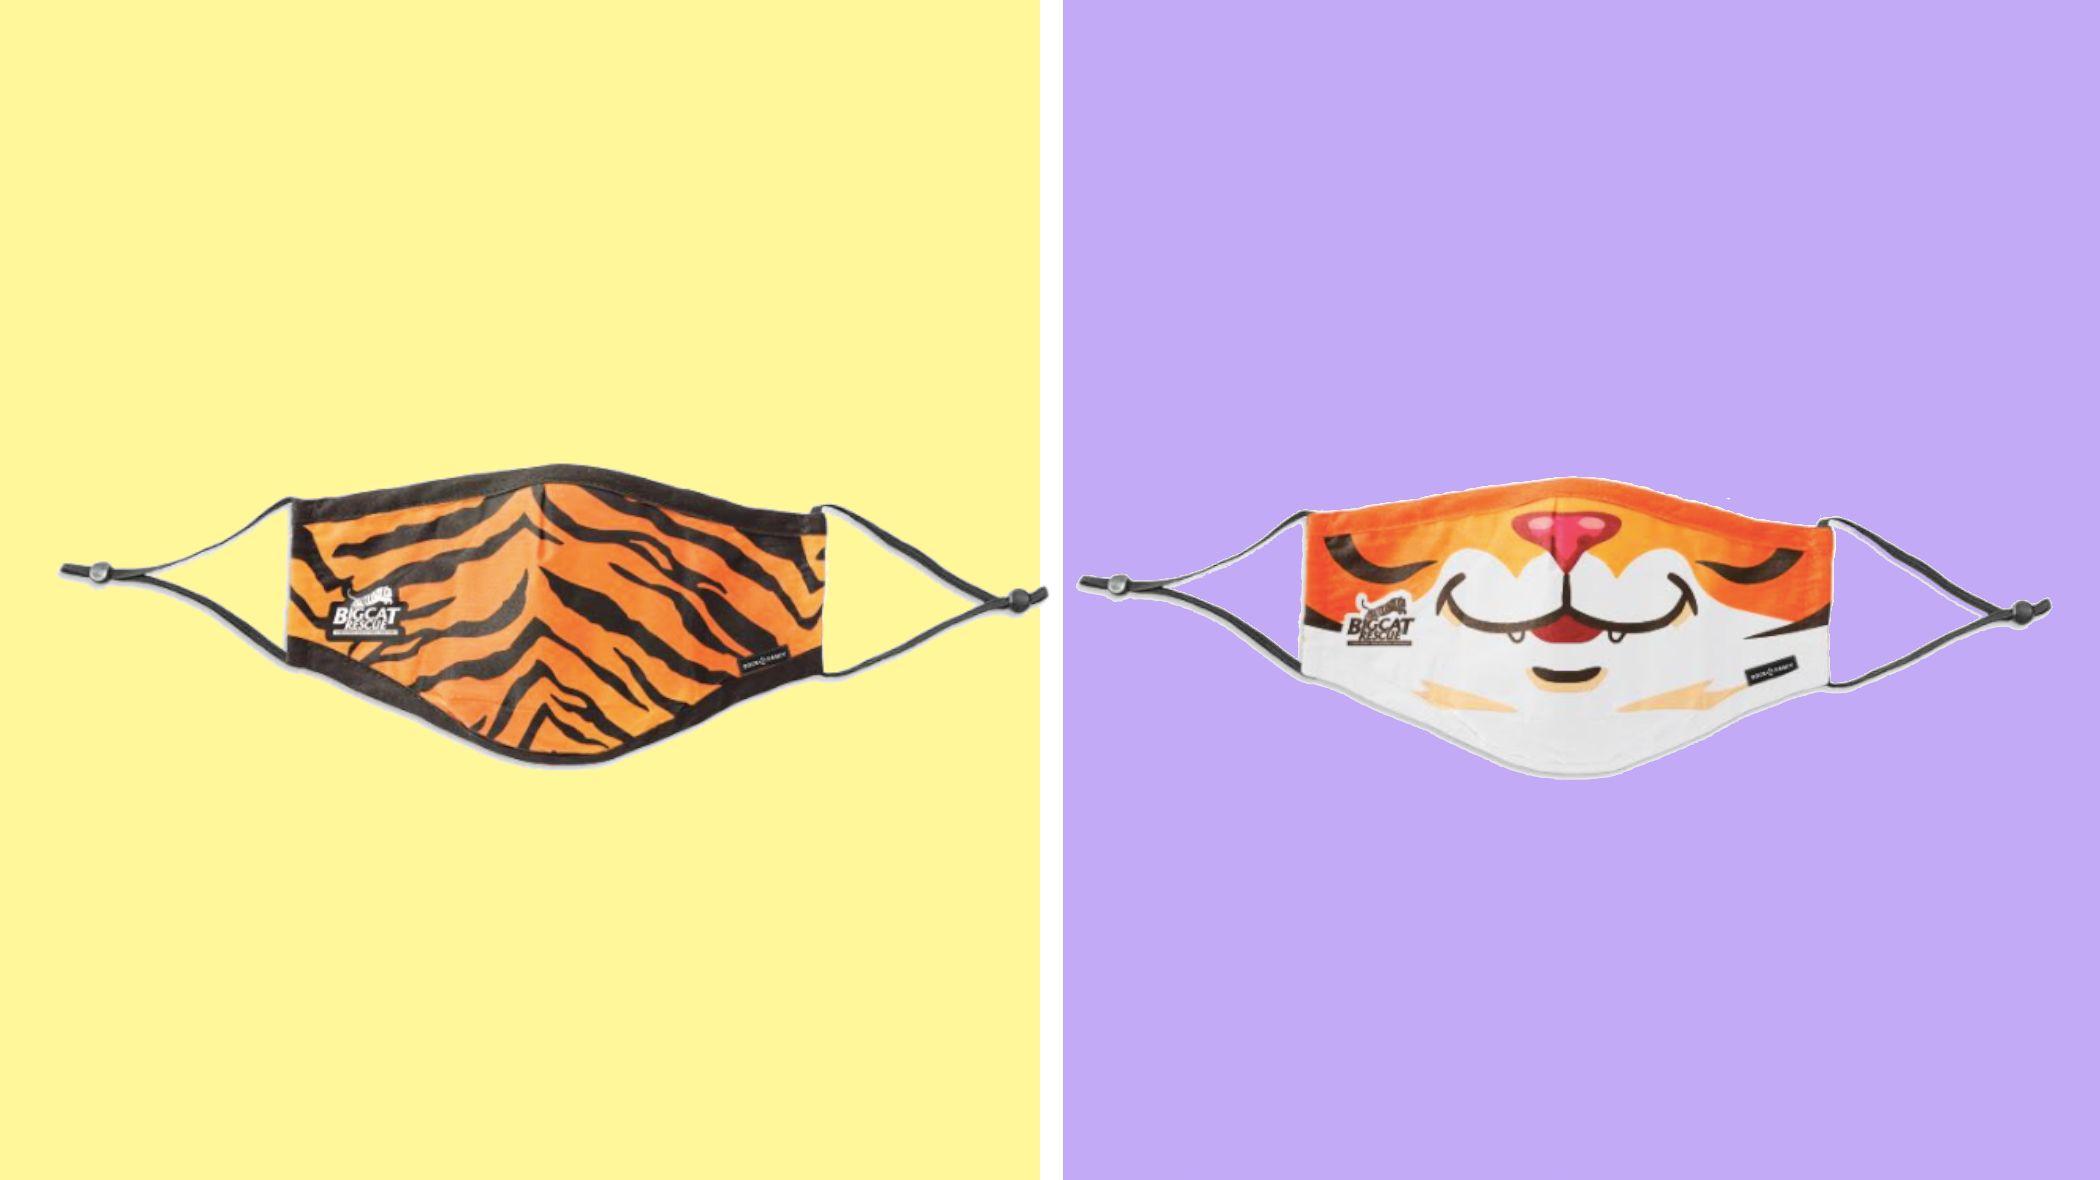 'Tiger King' Star Carole Baskin Has a Line of Face Masks